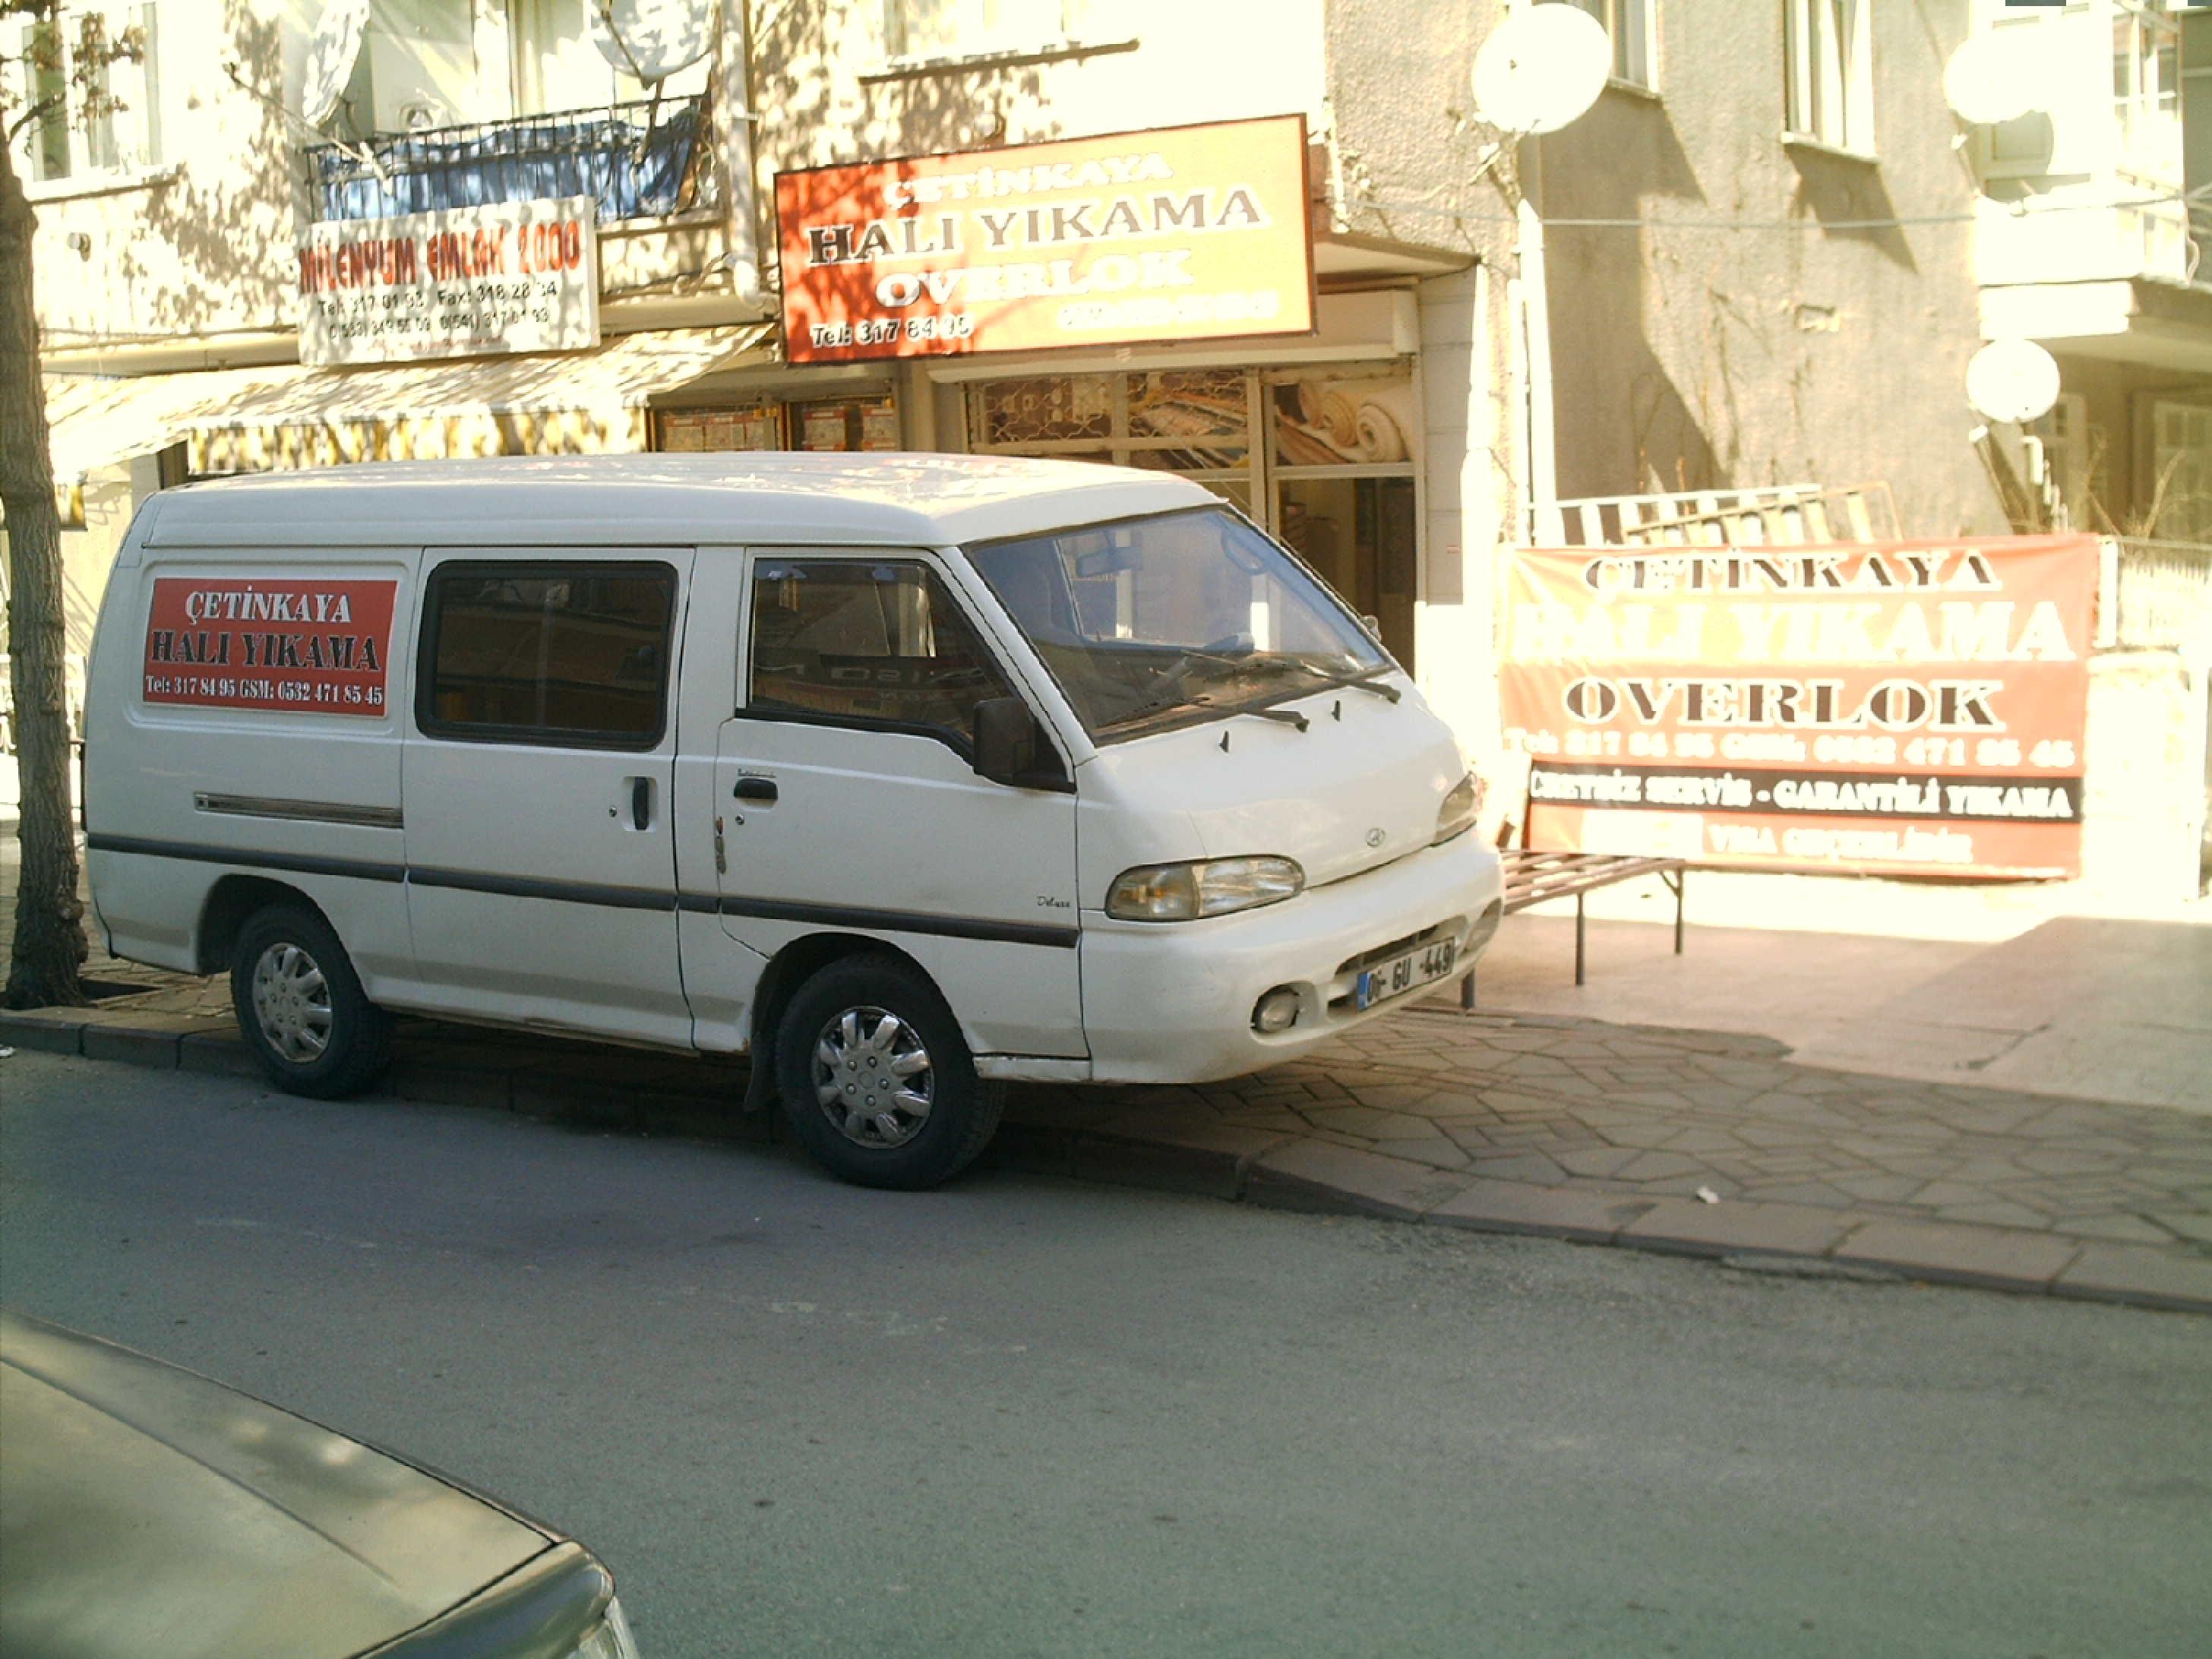 yahyalar_hali_yikama_servis